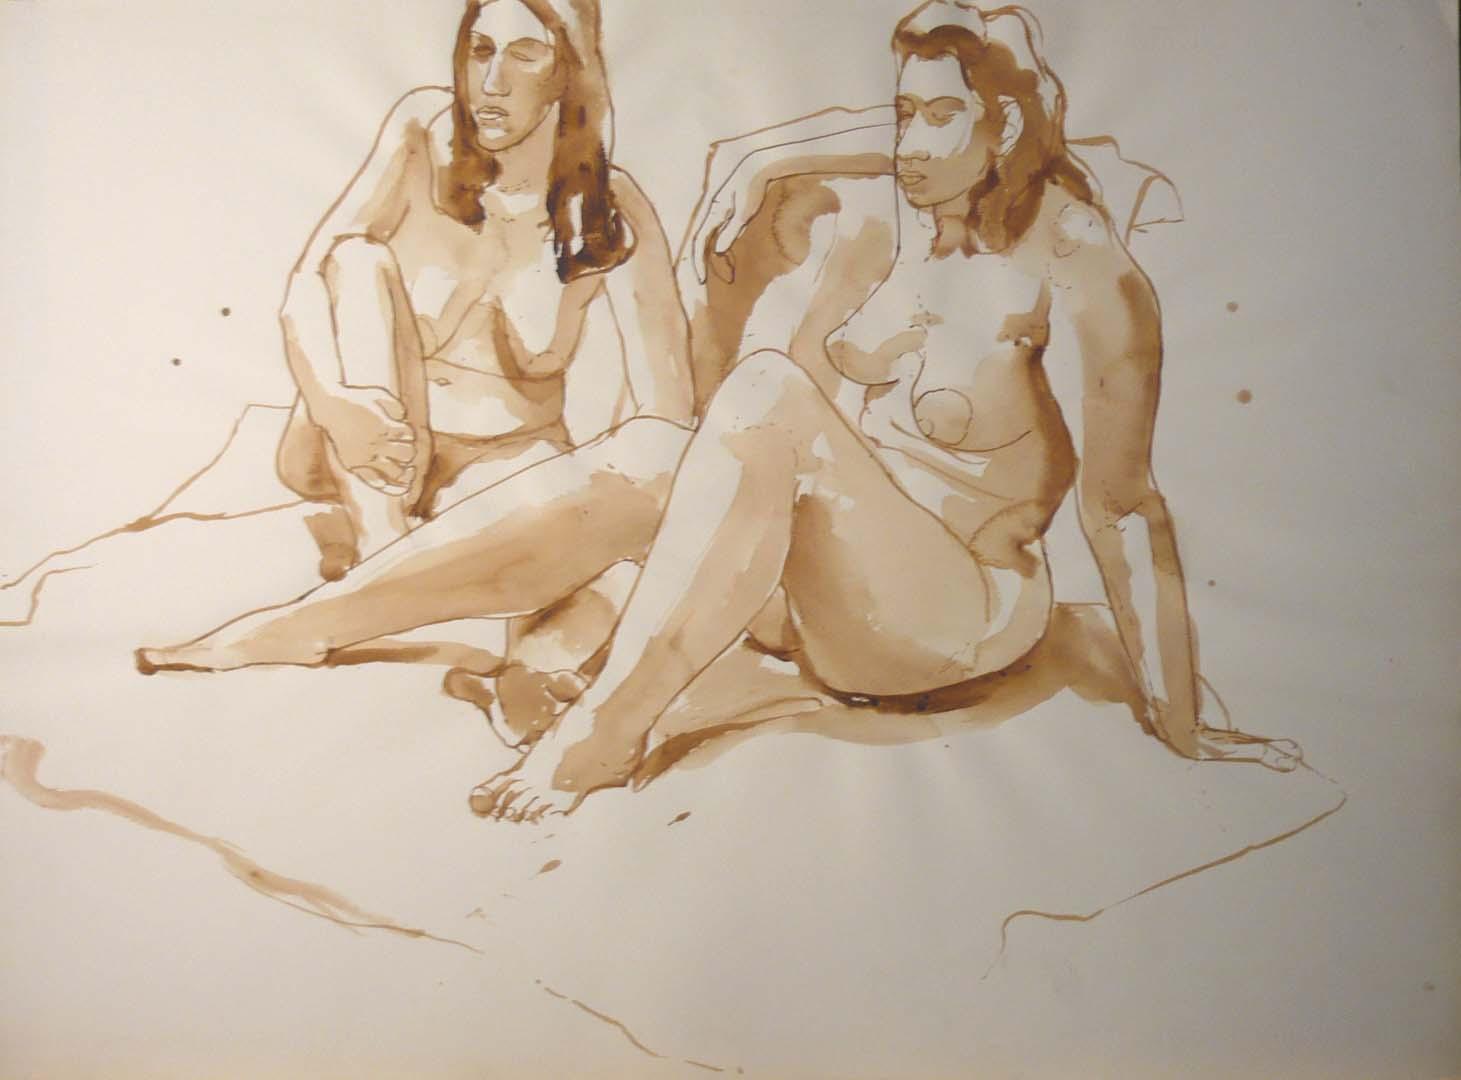 Two Female Models Seated in Studio Sepia 22 x 29.875